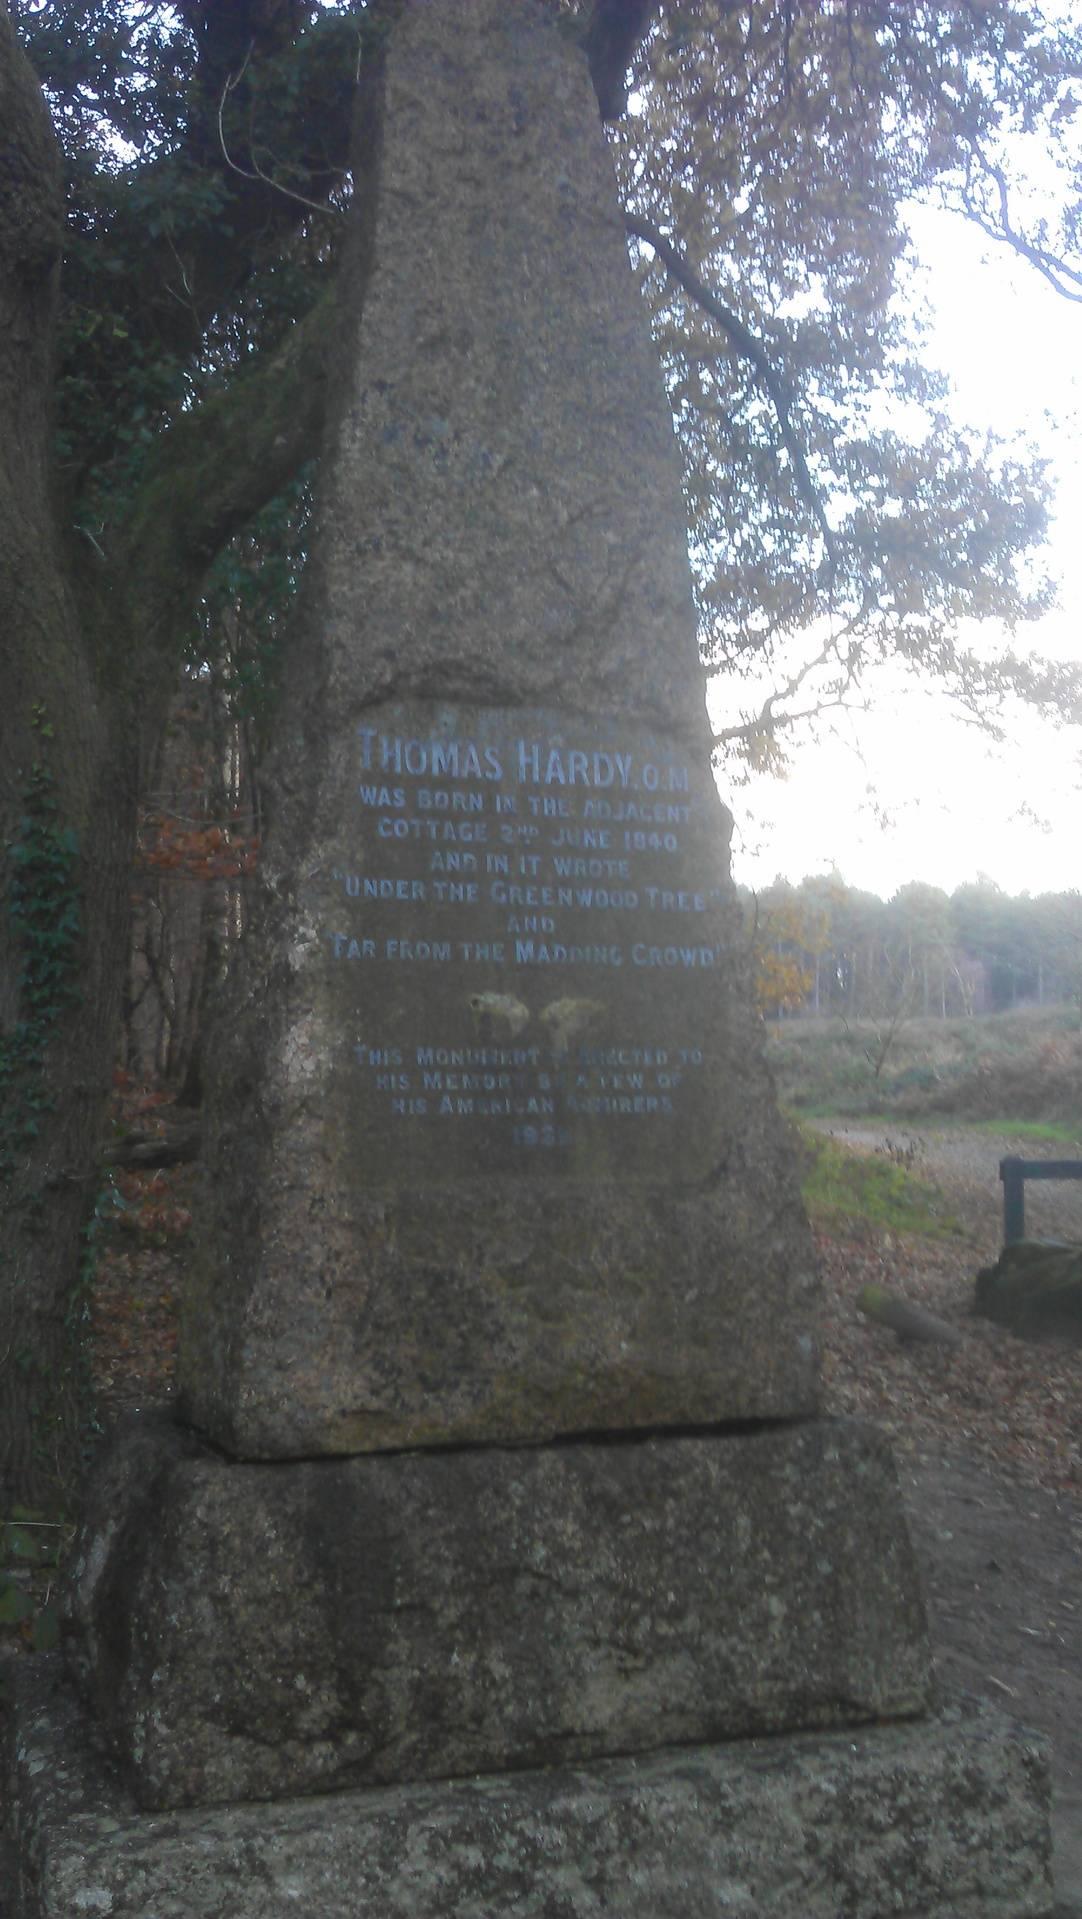 Thomas Hardy stone